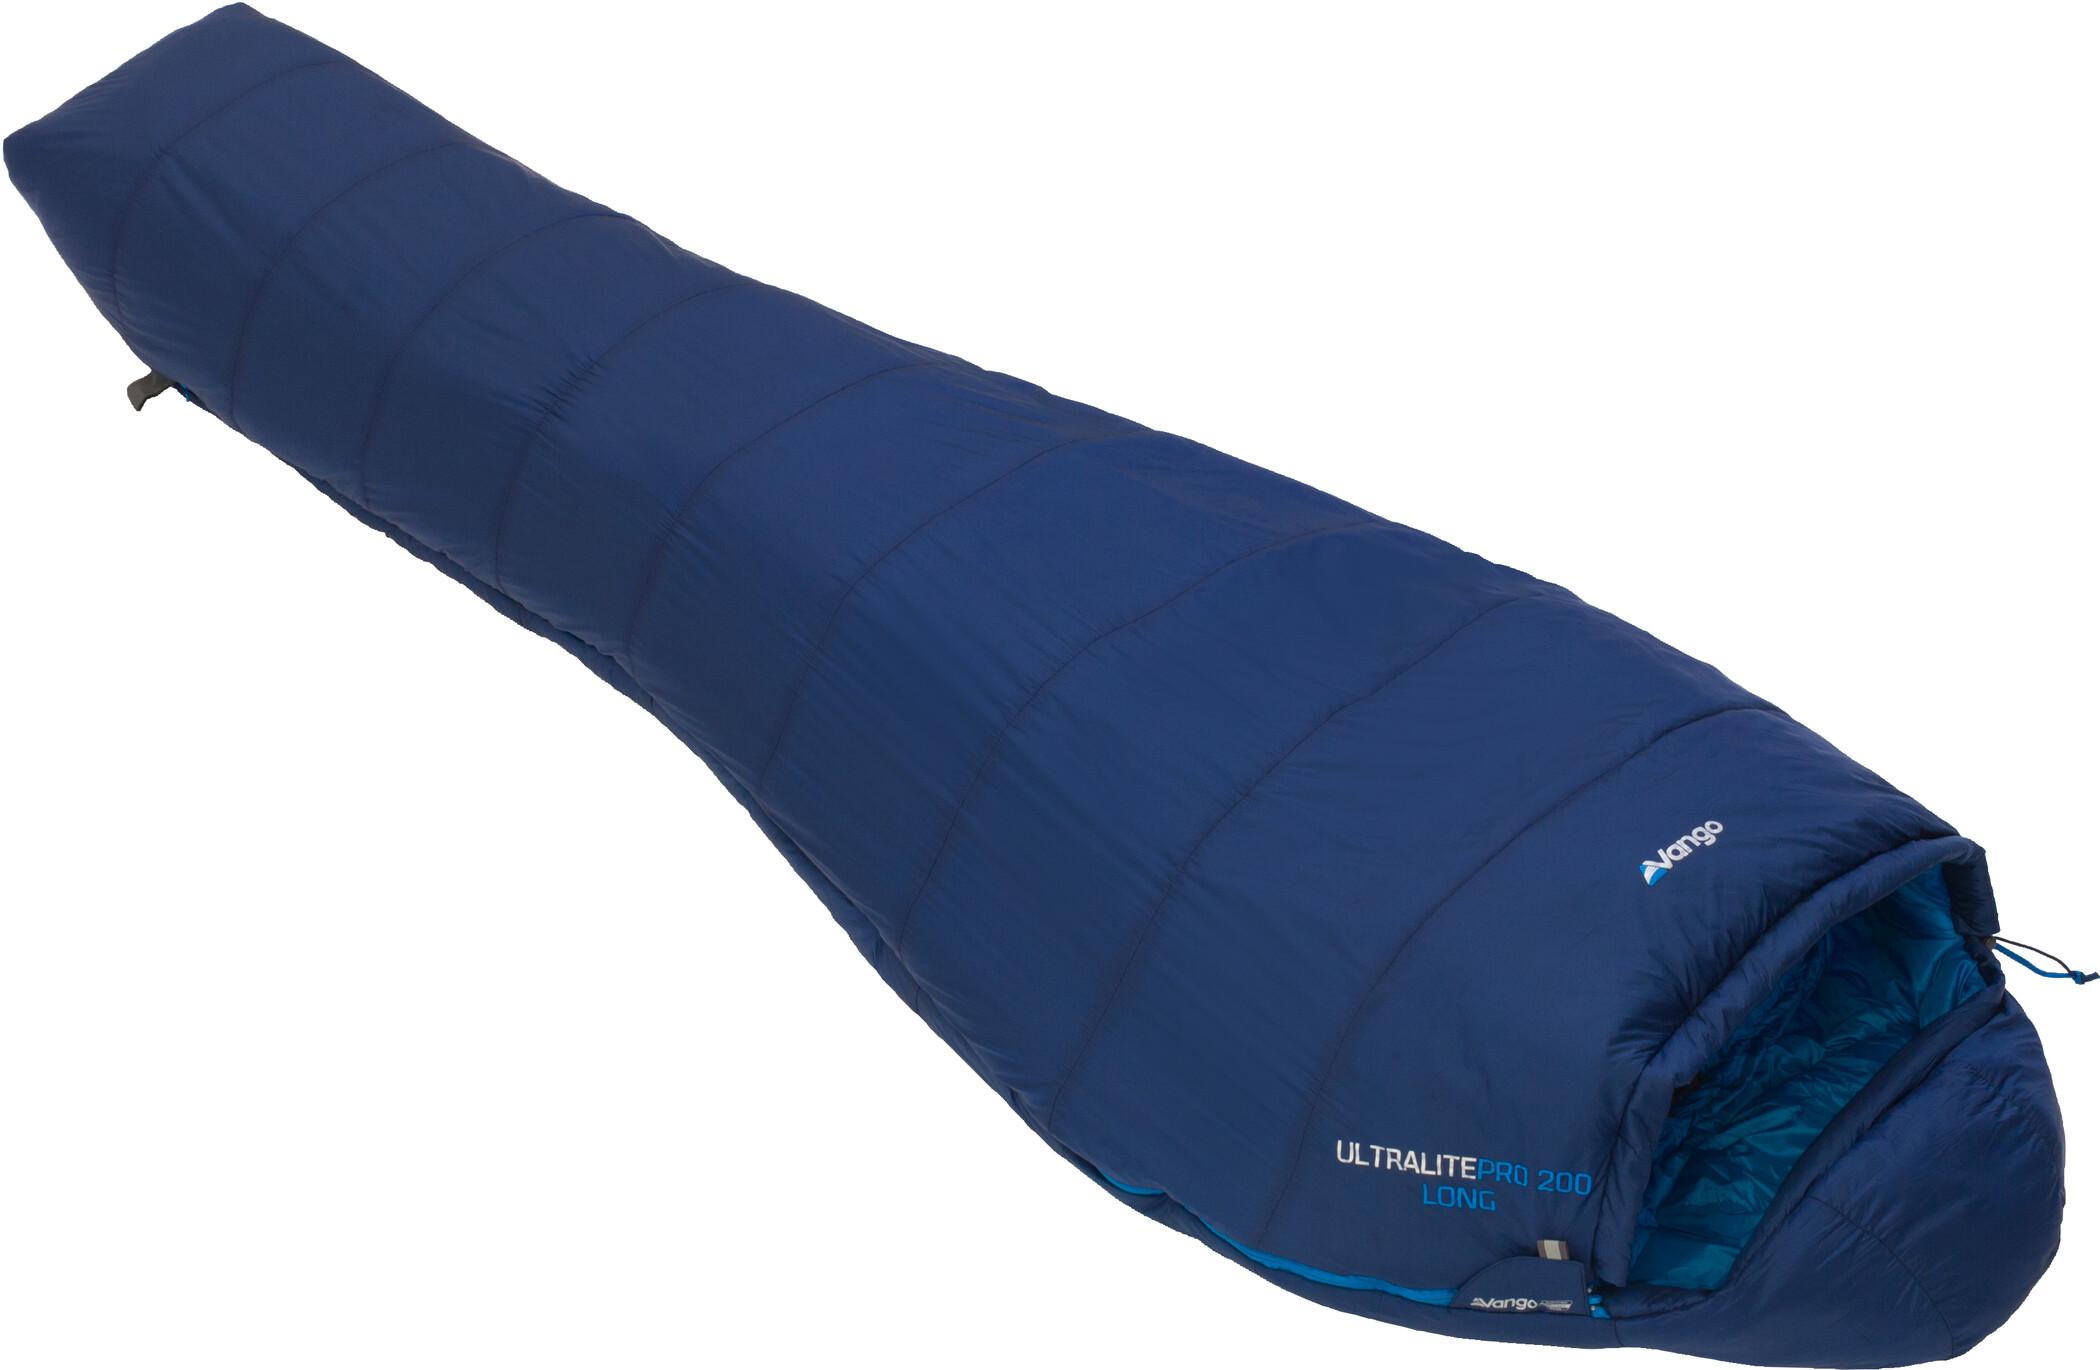 Vango Ultralite Pro 200 Sovepose, cobalt (2019) | Misc. Transportation and Storage